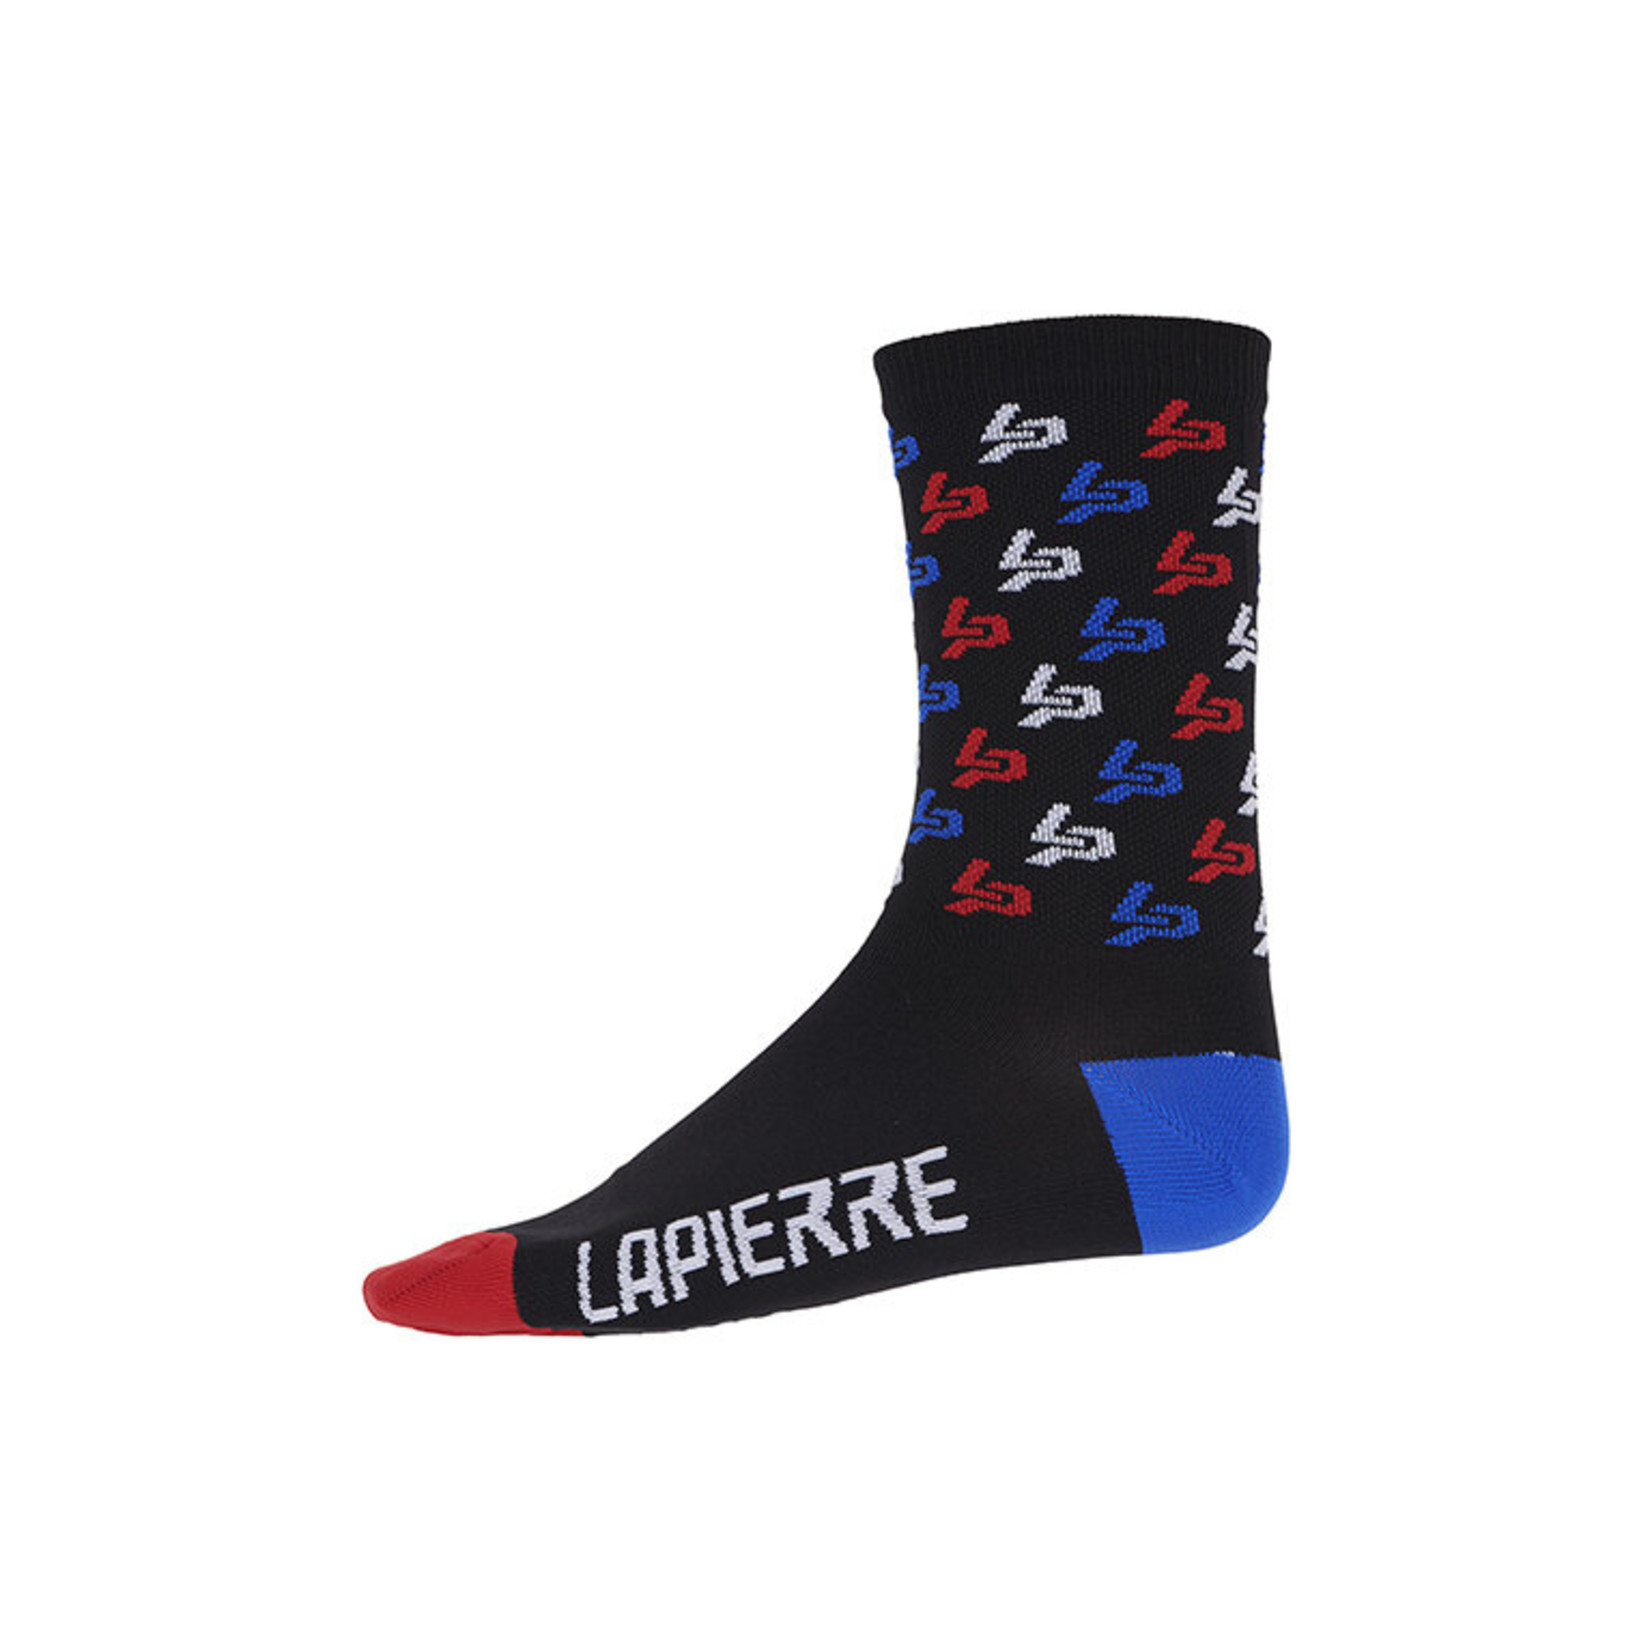 Lapierre So Frenchy Road Cycling Socks 43-46